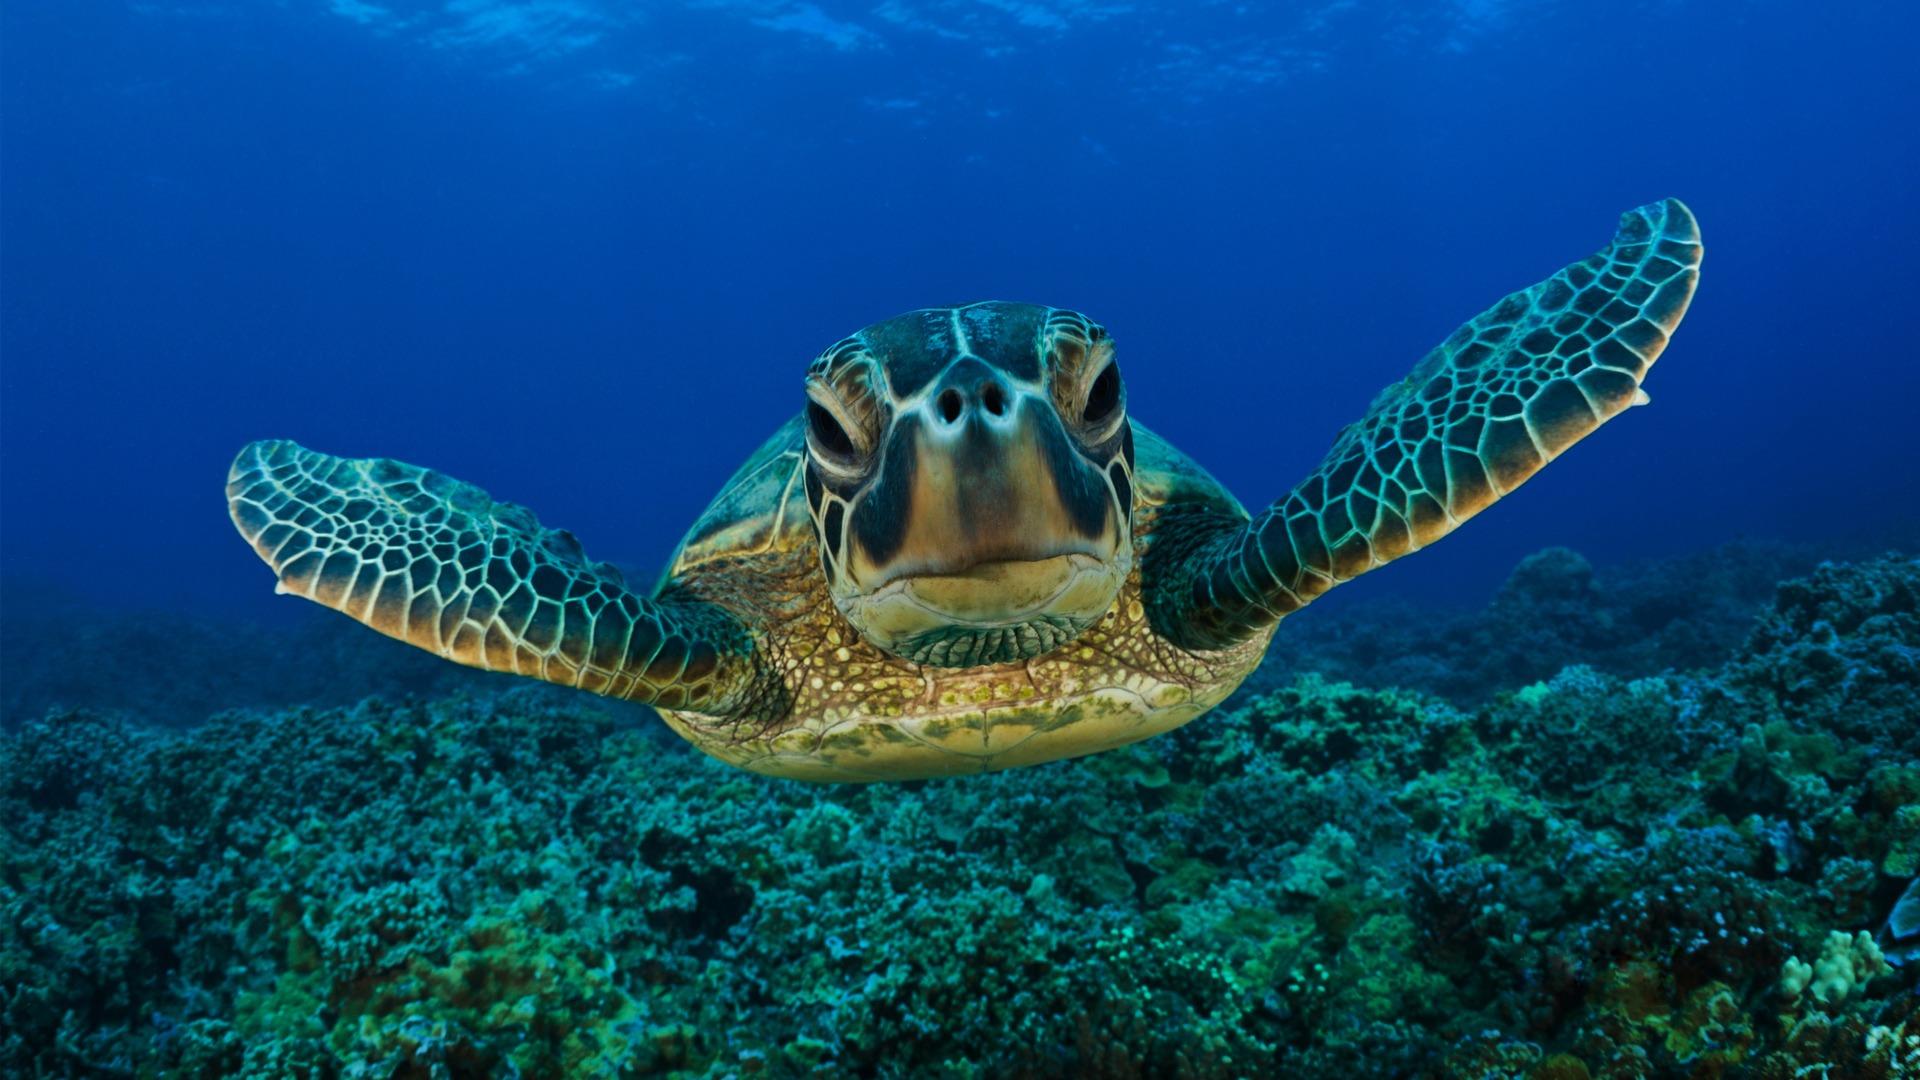 Se salviamo le tartarughe, salveremo il mondo…1°Parte